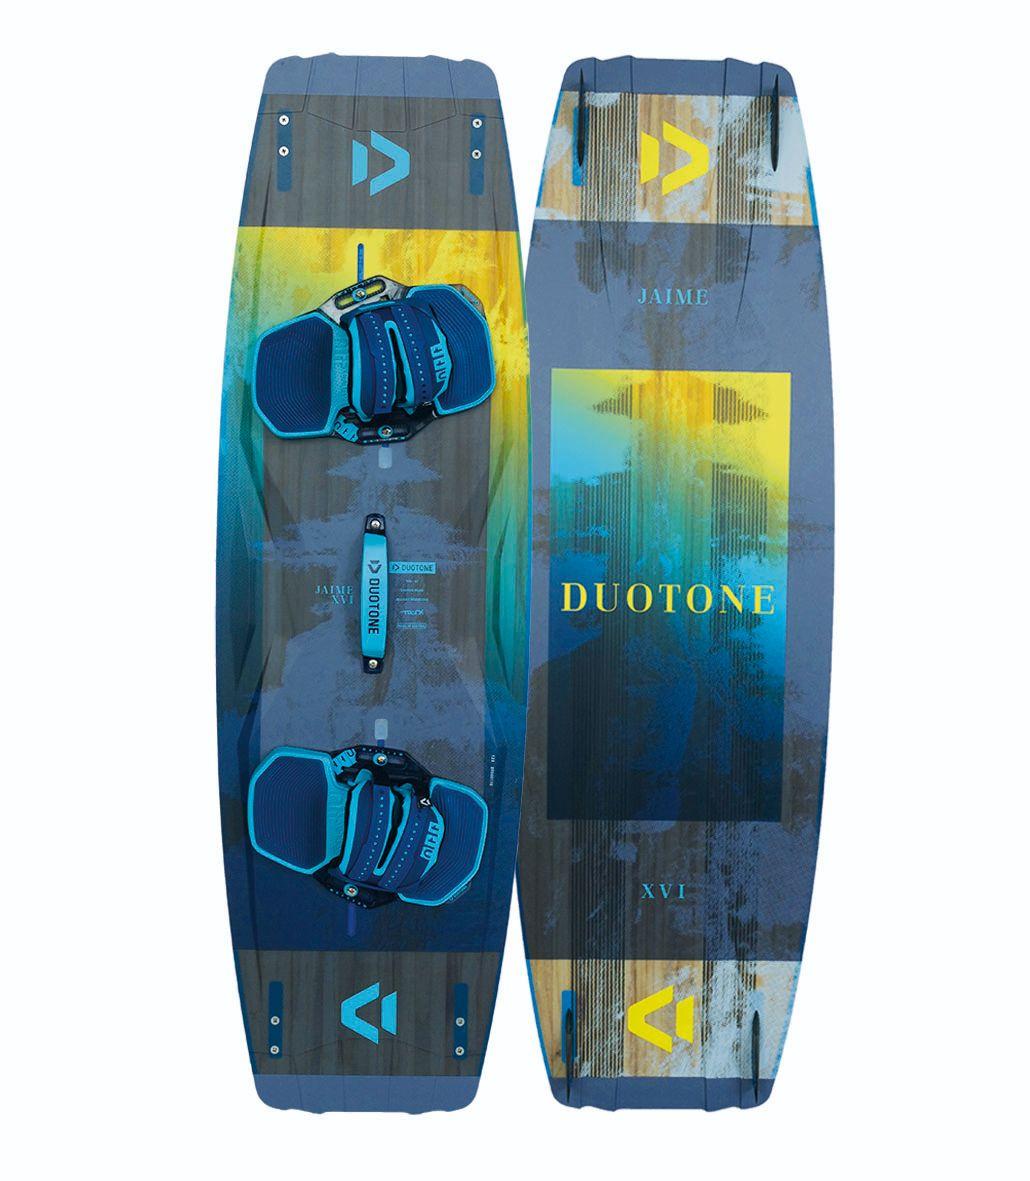 Duotone Jaime 2019 Kiteboard + Duotone Entity Combo 2019 Bindung durch Preisvorschlag für 550€